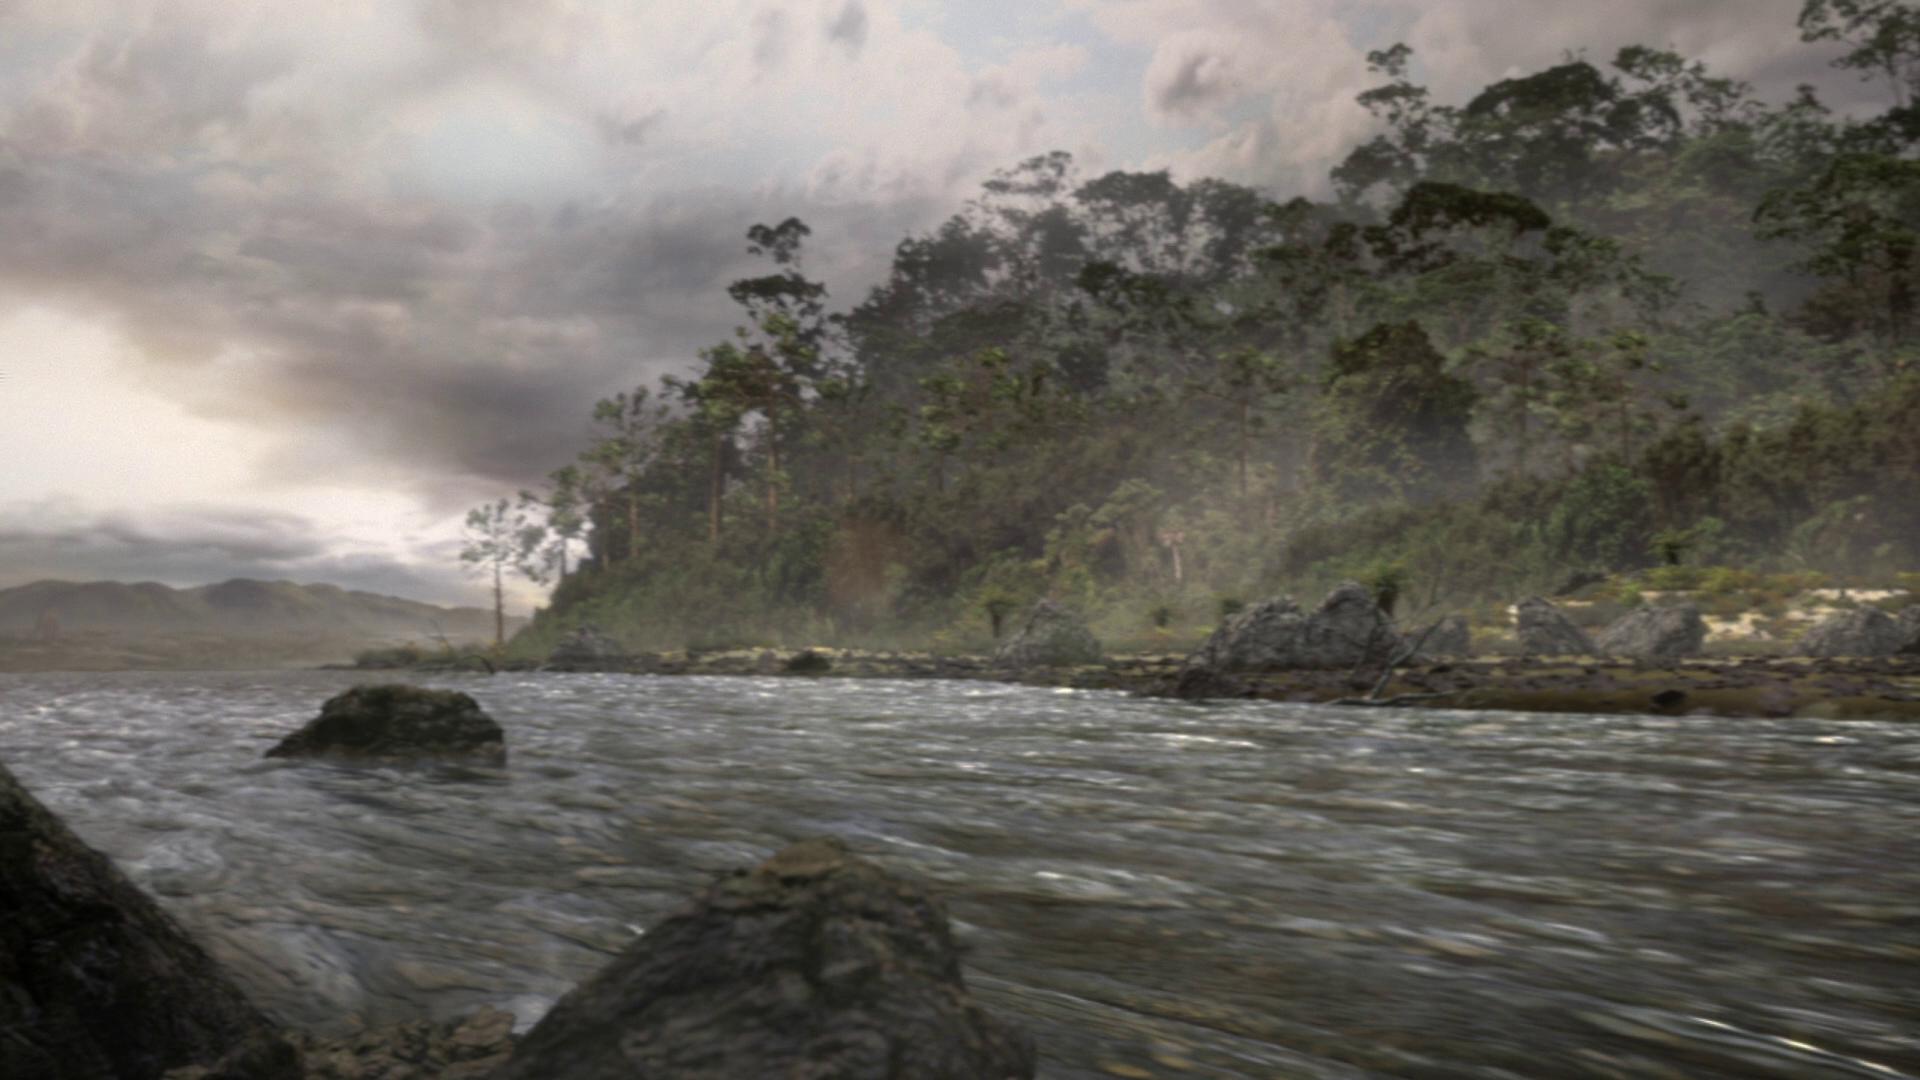 Onchopristis river - Planet Dinosaur Wiki